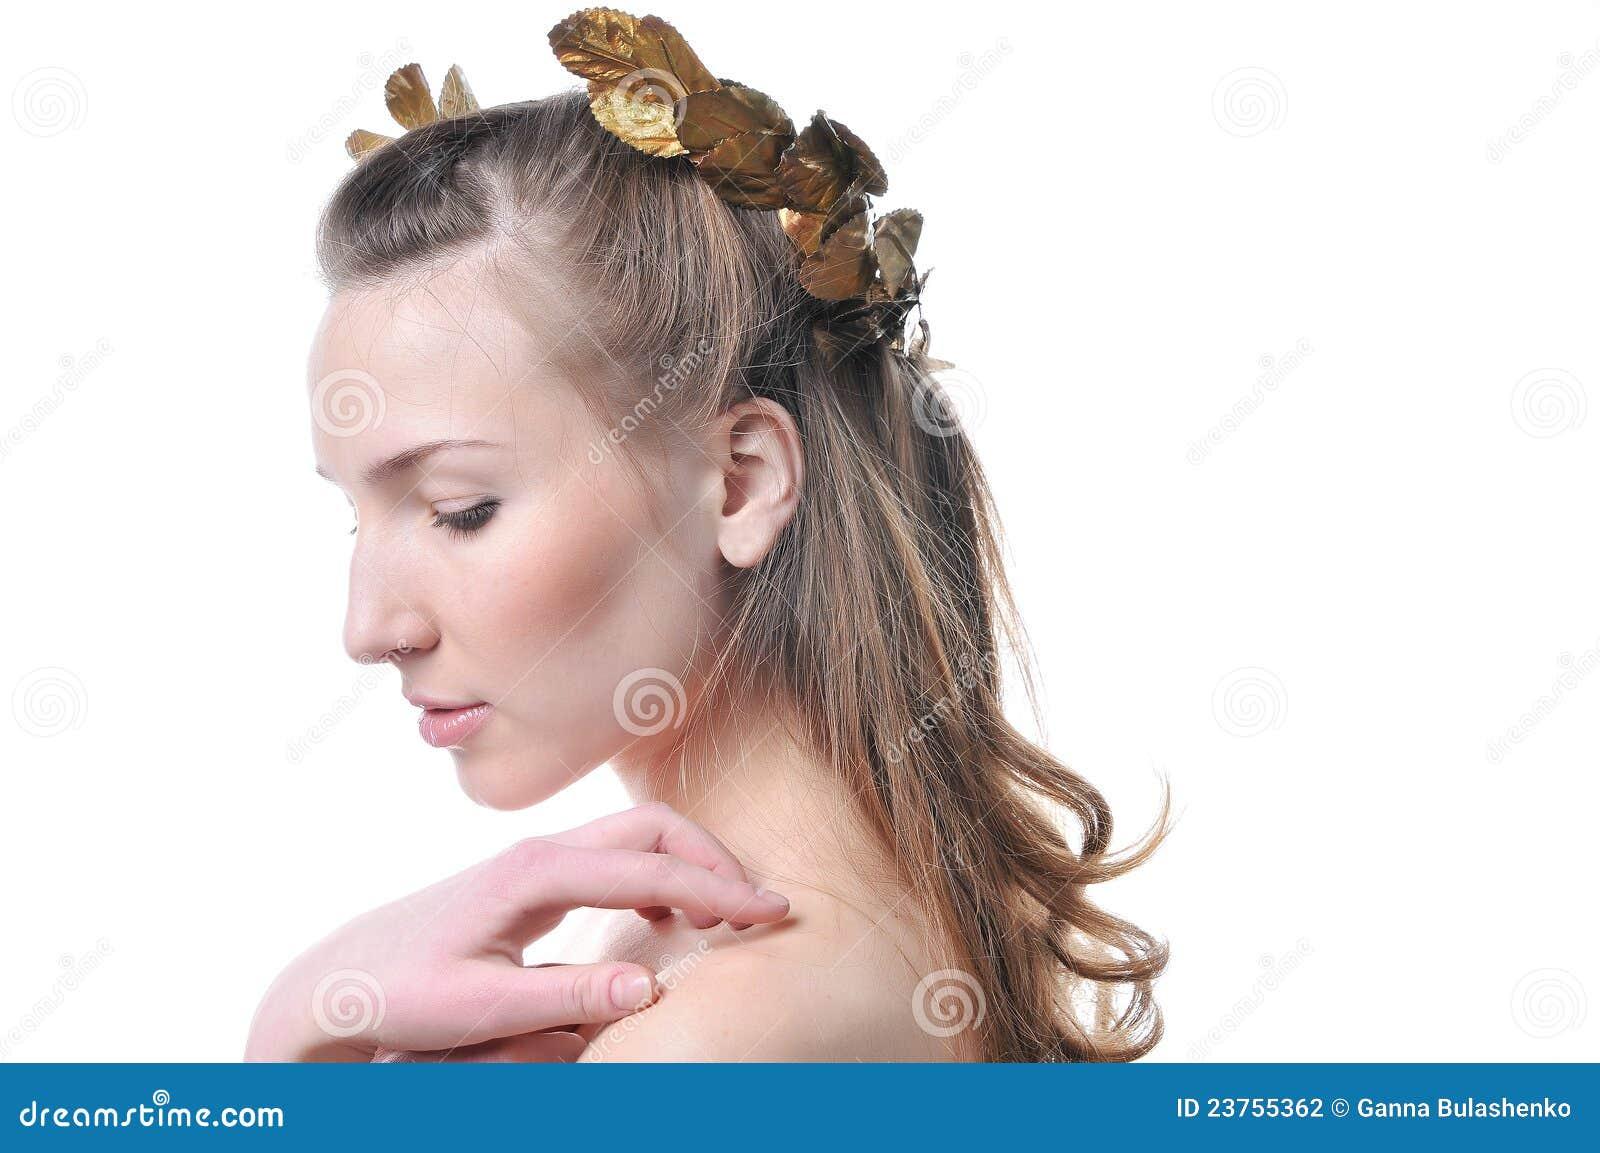 fb7dab13ca7 Profile Of A Beautiful Woman Stock Photo - Image of energy ...